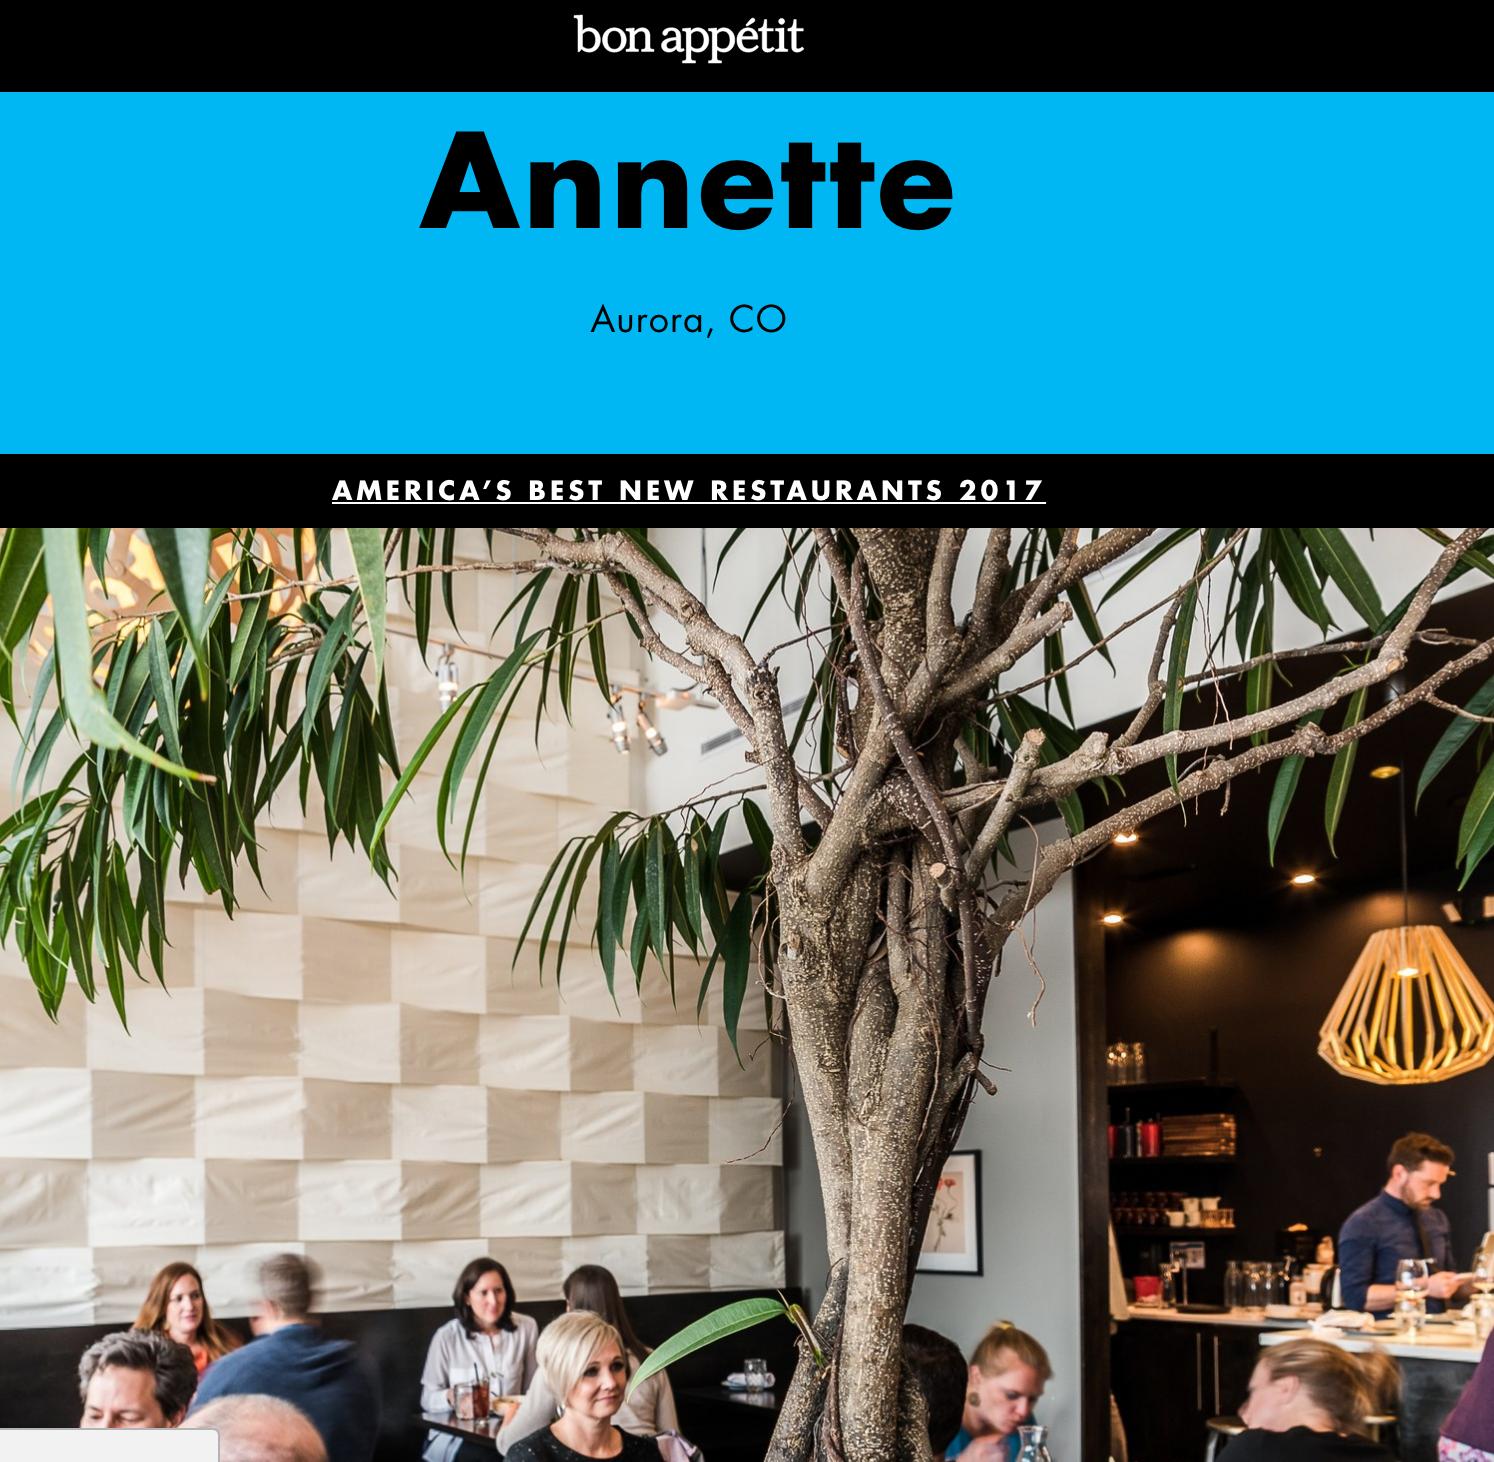 America's best new restaurants (Bon Appétit)